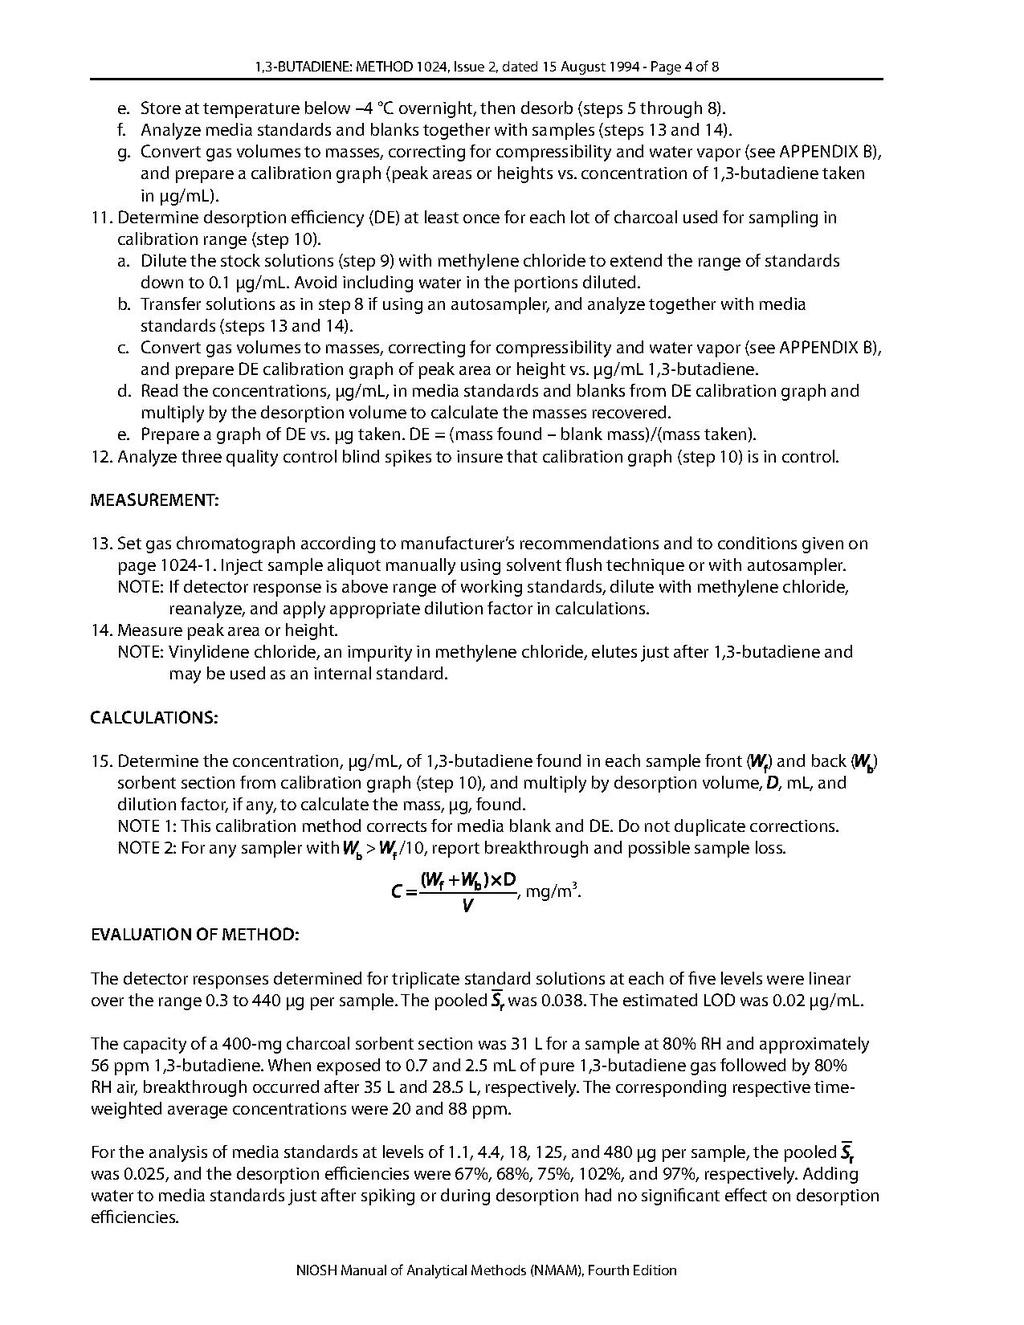 Page:NIOSH Manual of Analytical Methods - 1024 pdf/4